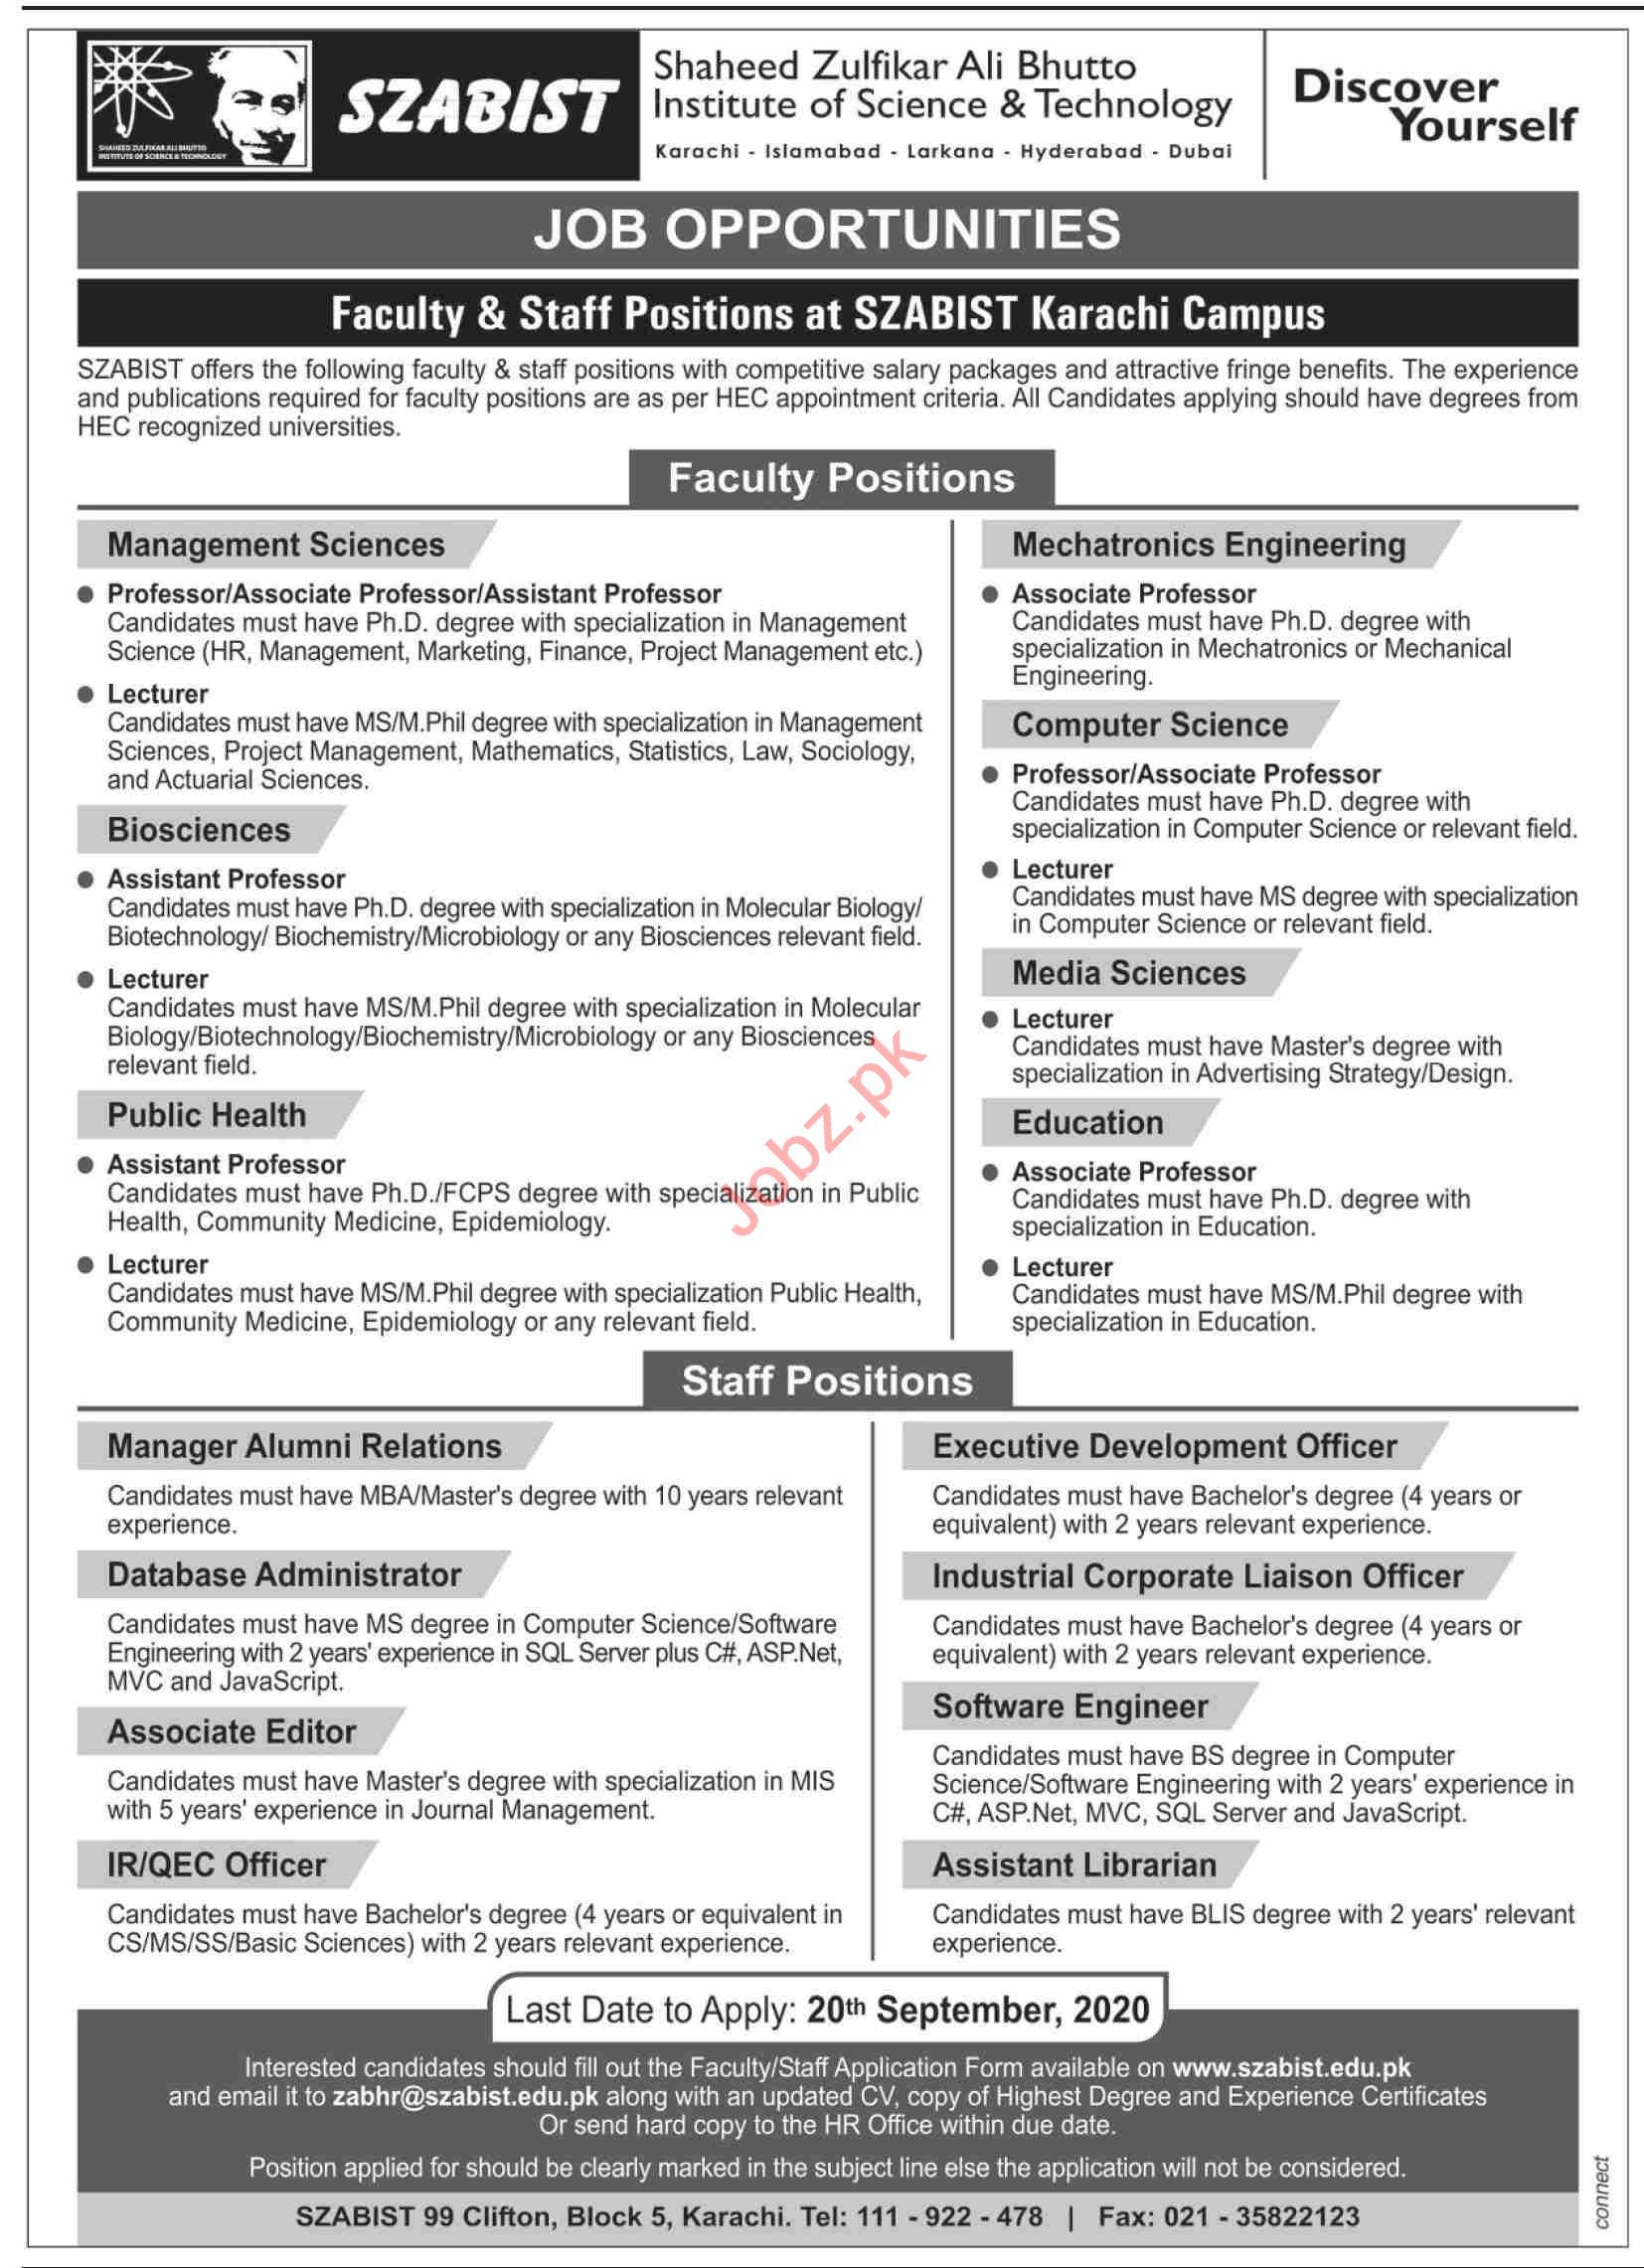 SZABIST University Karachi Jobs 2020 Faculty & Office Staff